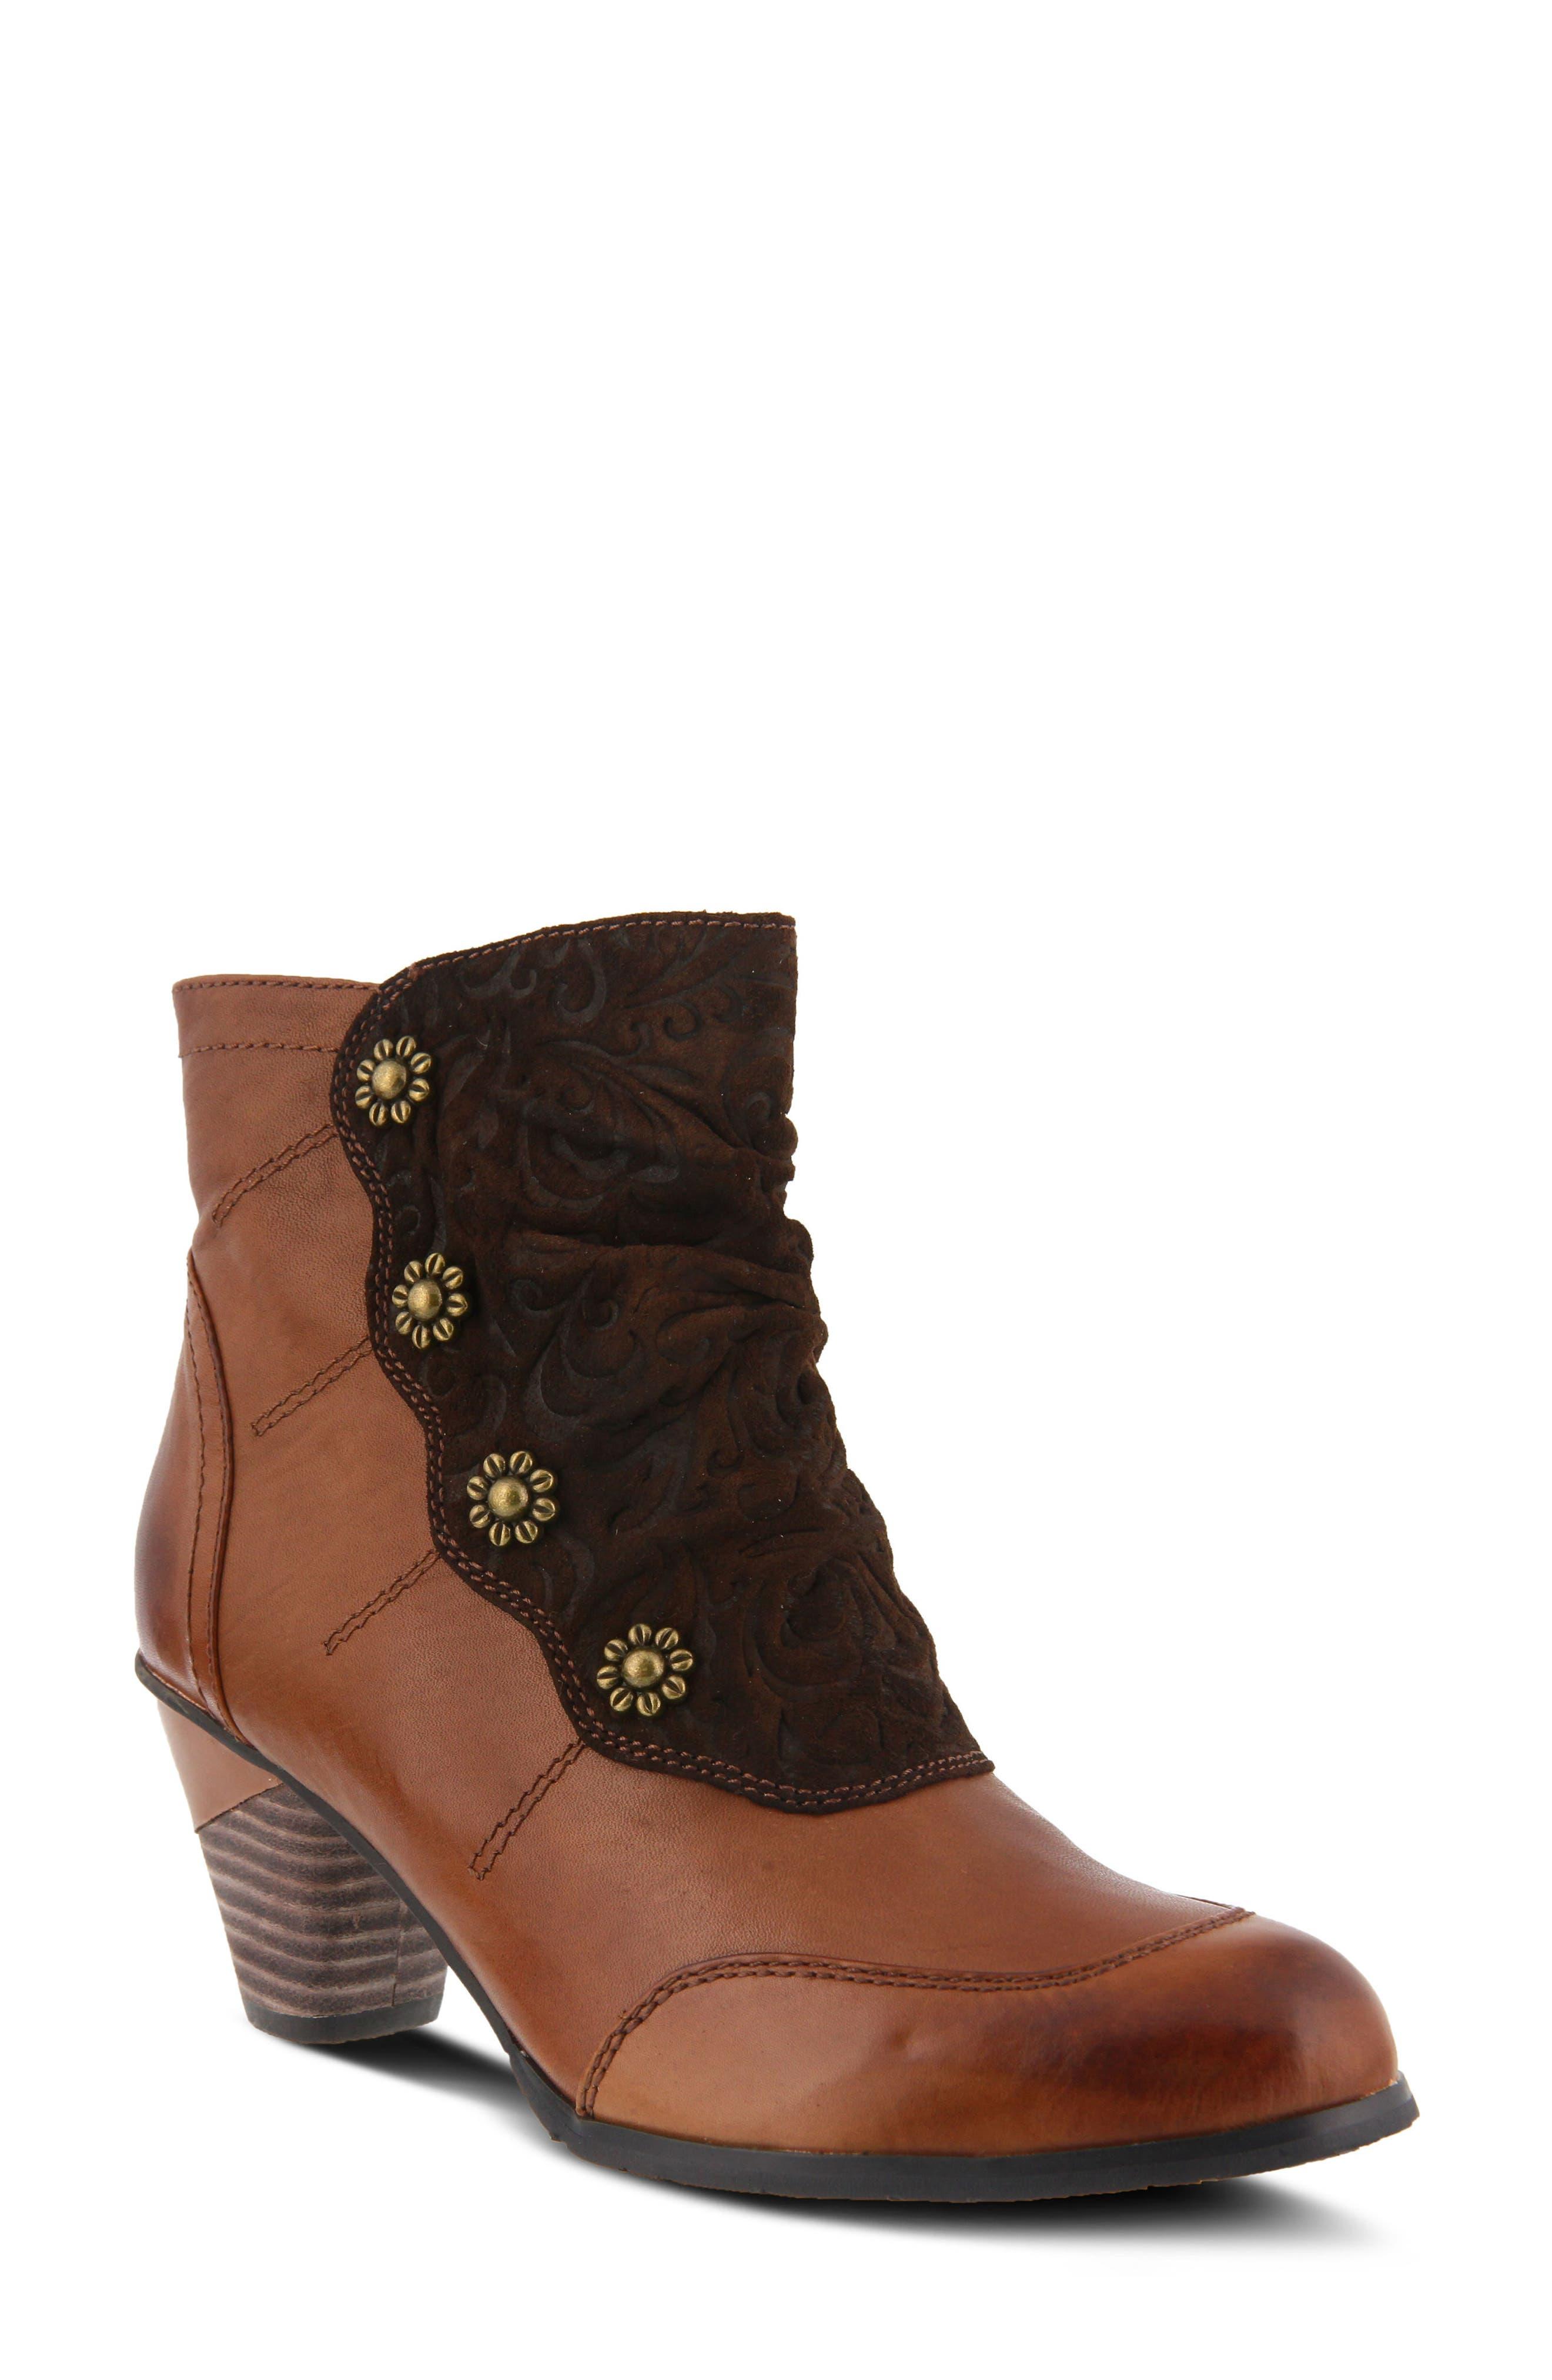 L'Artiste Belgard Bootie,                         Main,                         color, Brown Leather